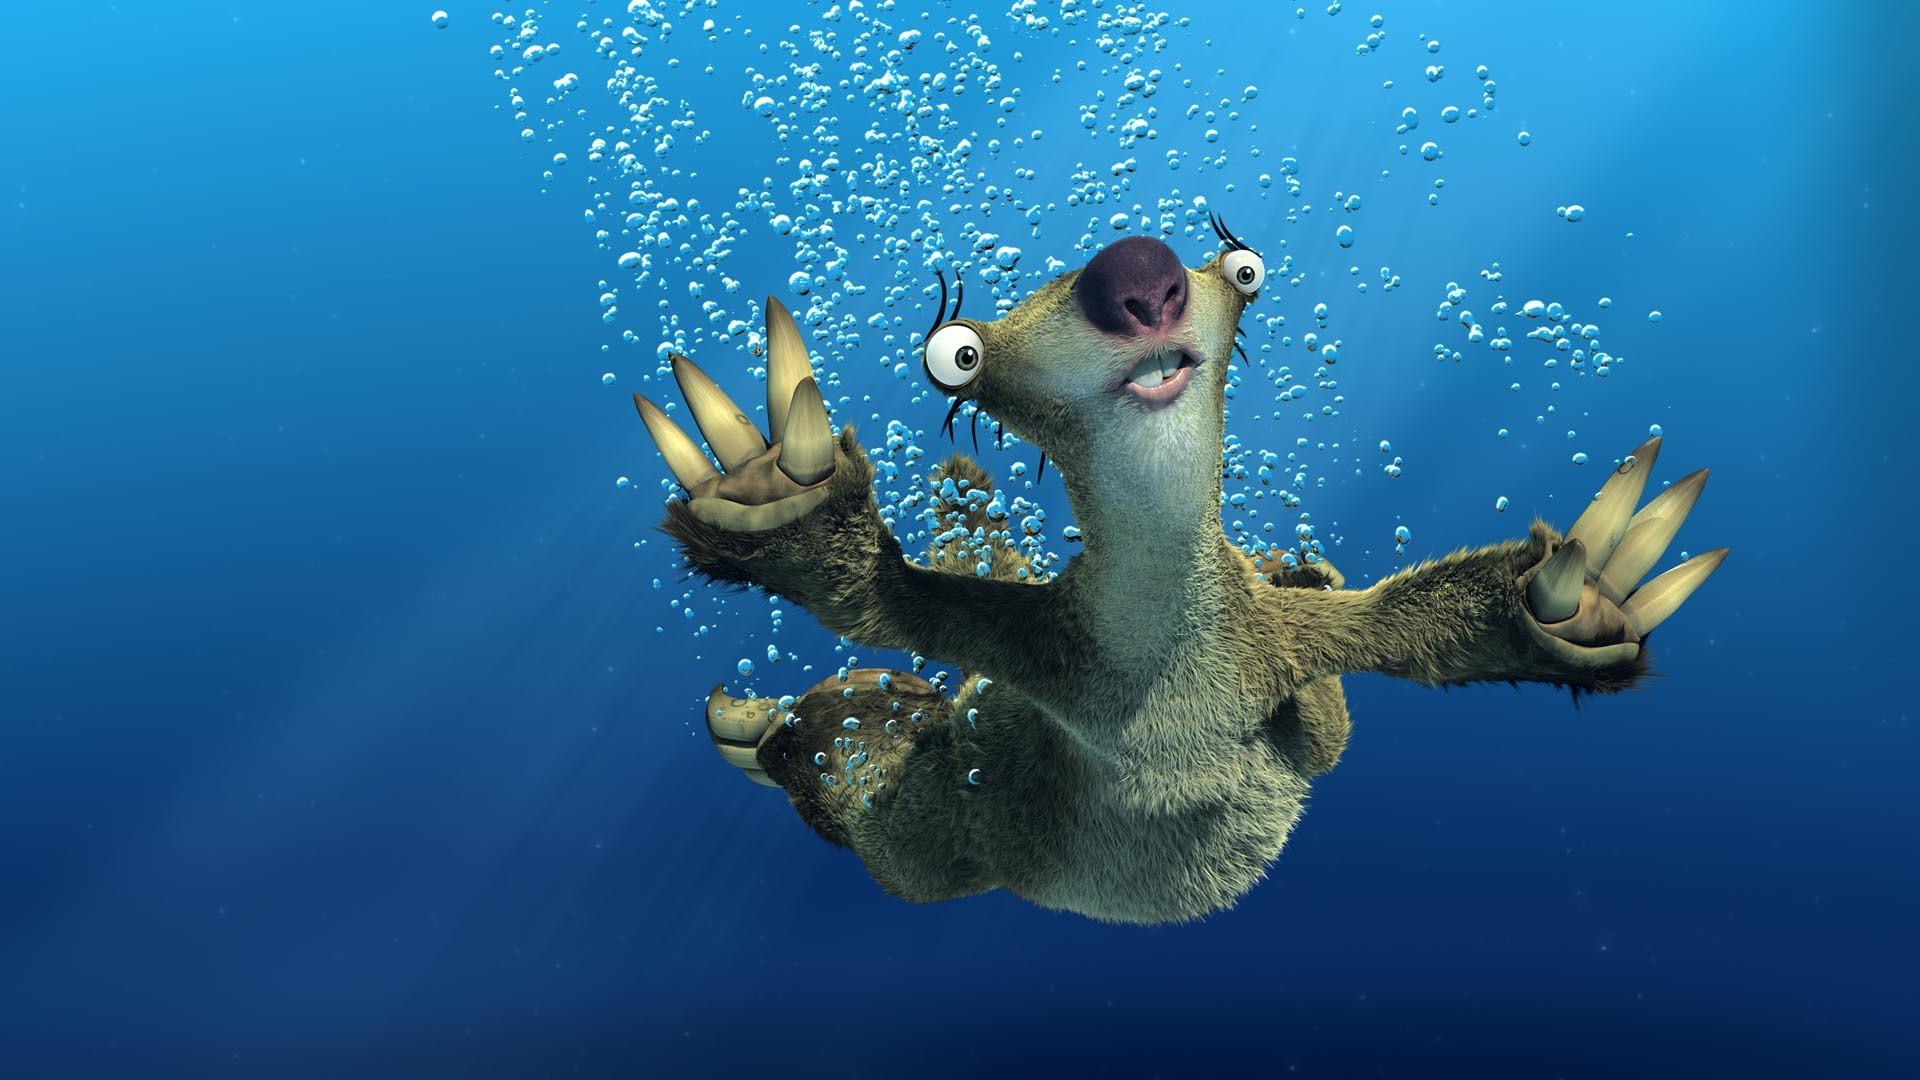 Ice Age – Sloth HD Wallpaper. Â«